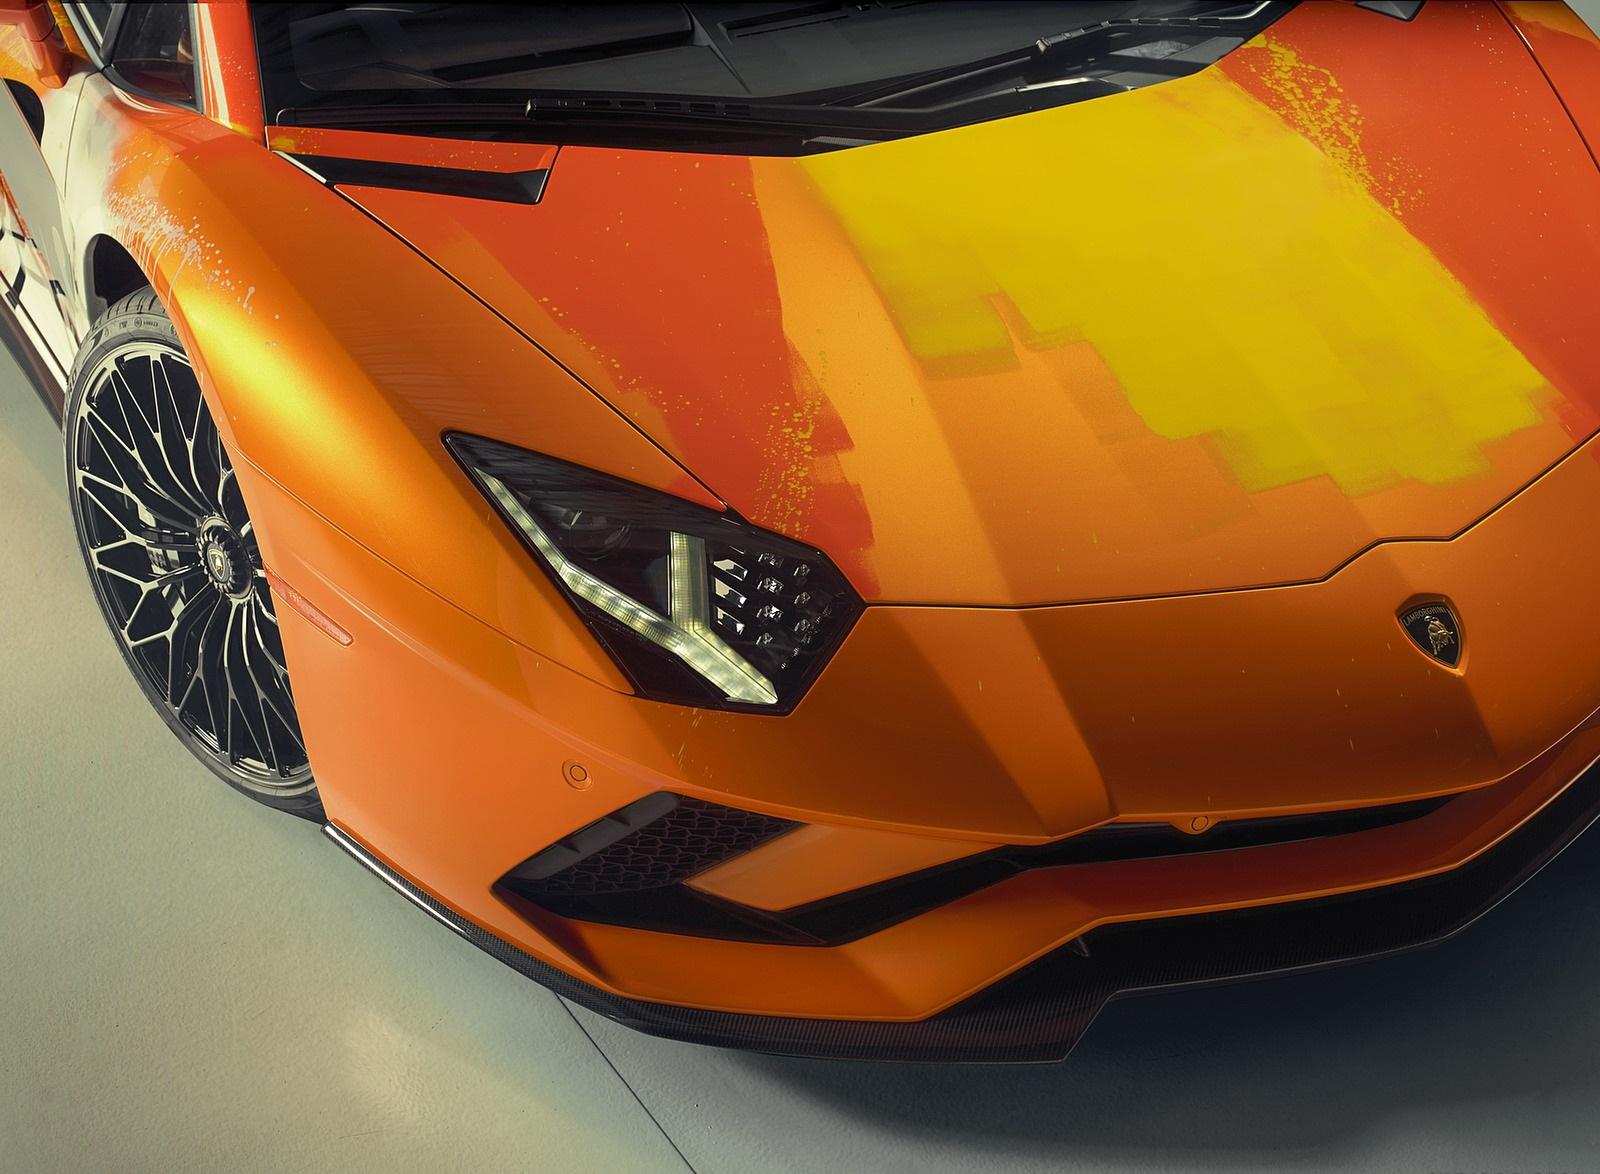 2019 Lamborghini Aventador S by Skyler Grey Headlight Wallpapers (13)